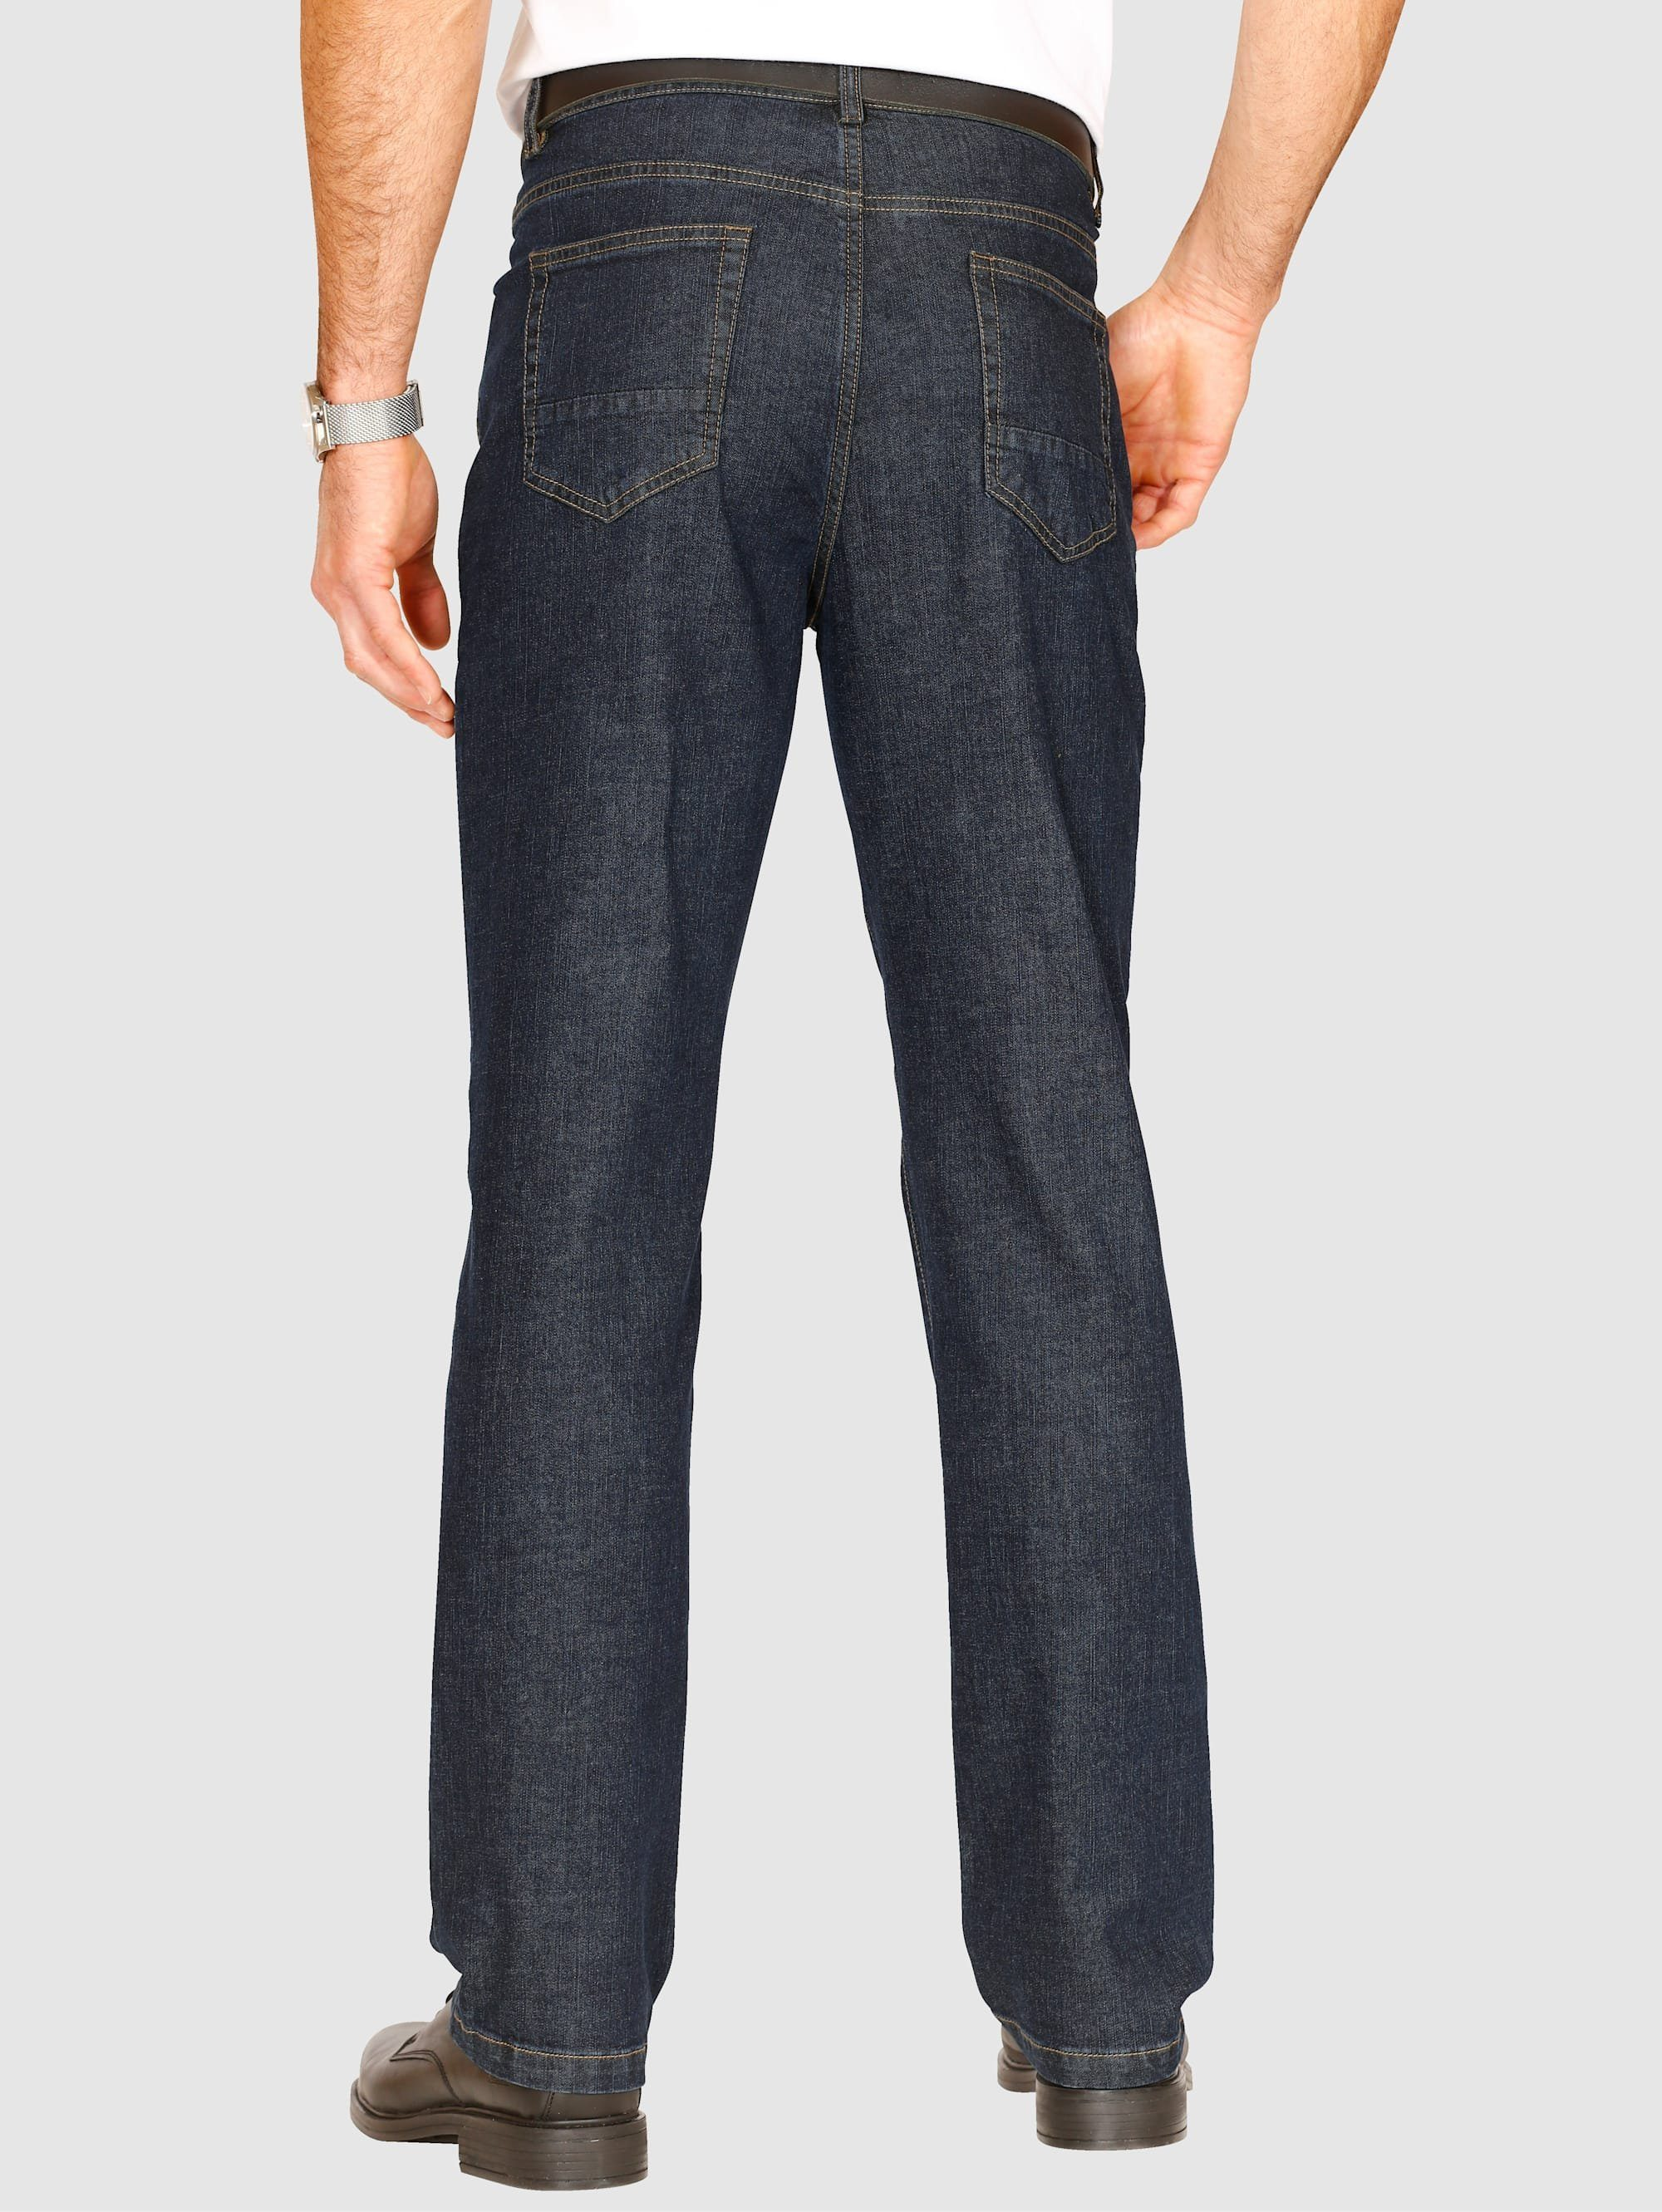 Roger Kent 5-Pocket Jeans in büglleichter Qualität